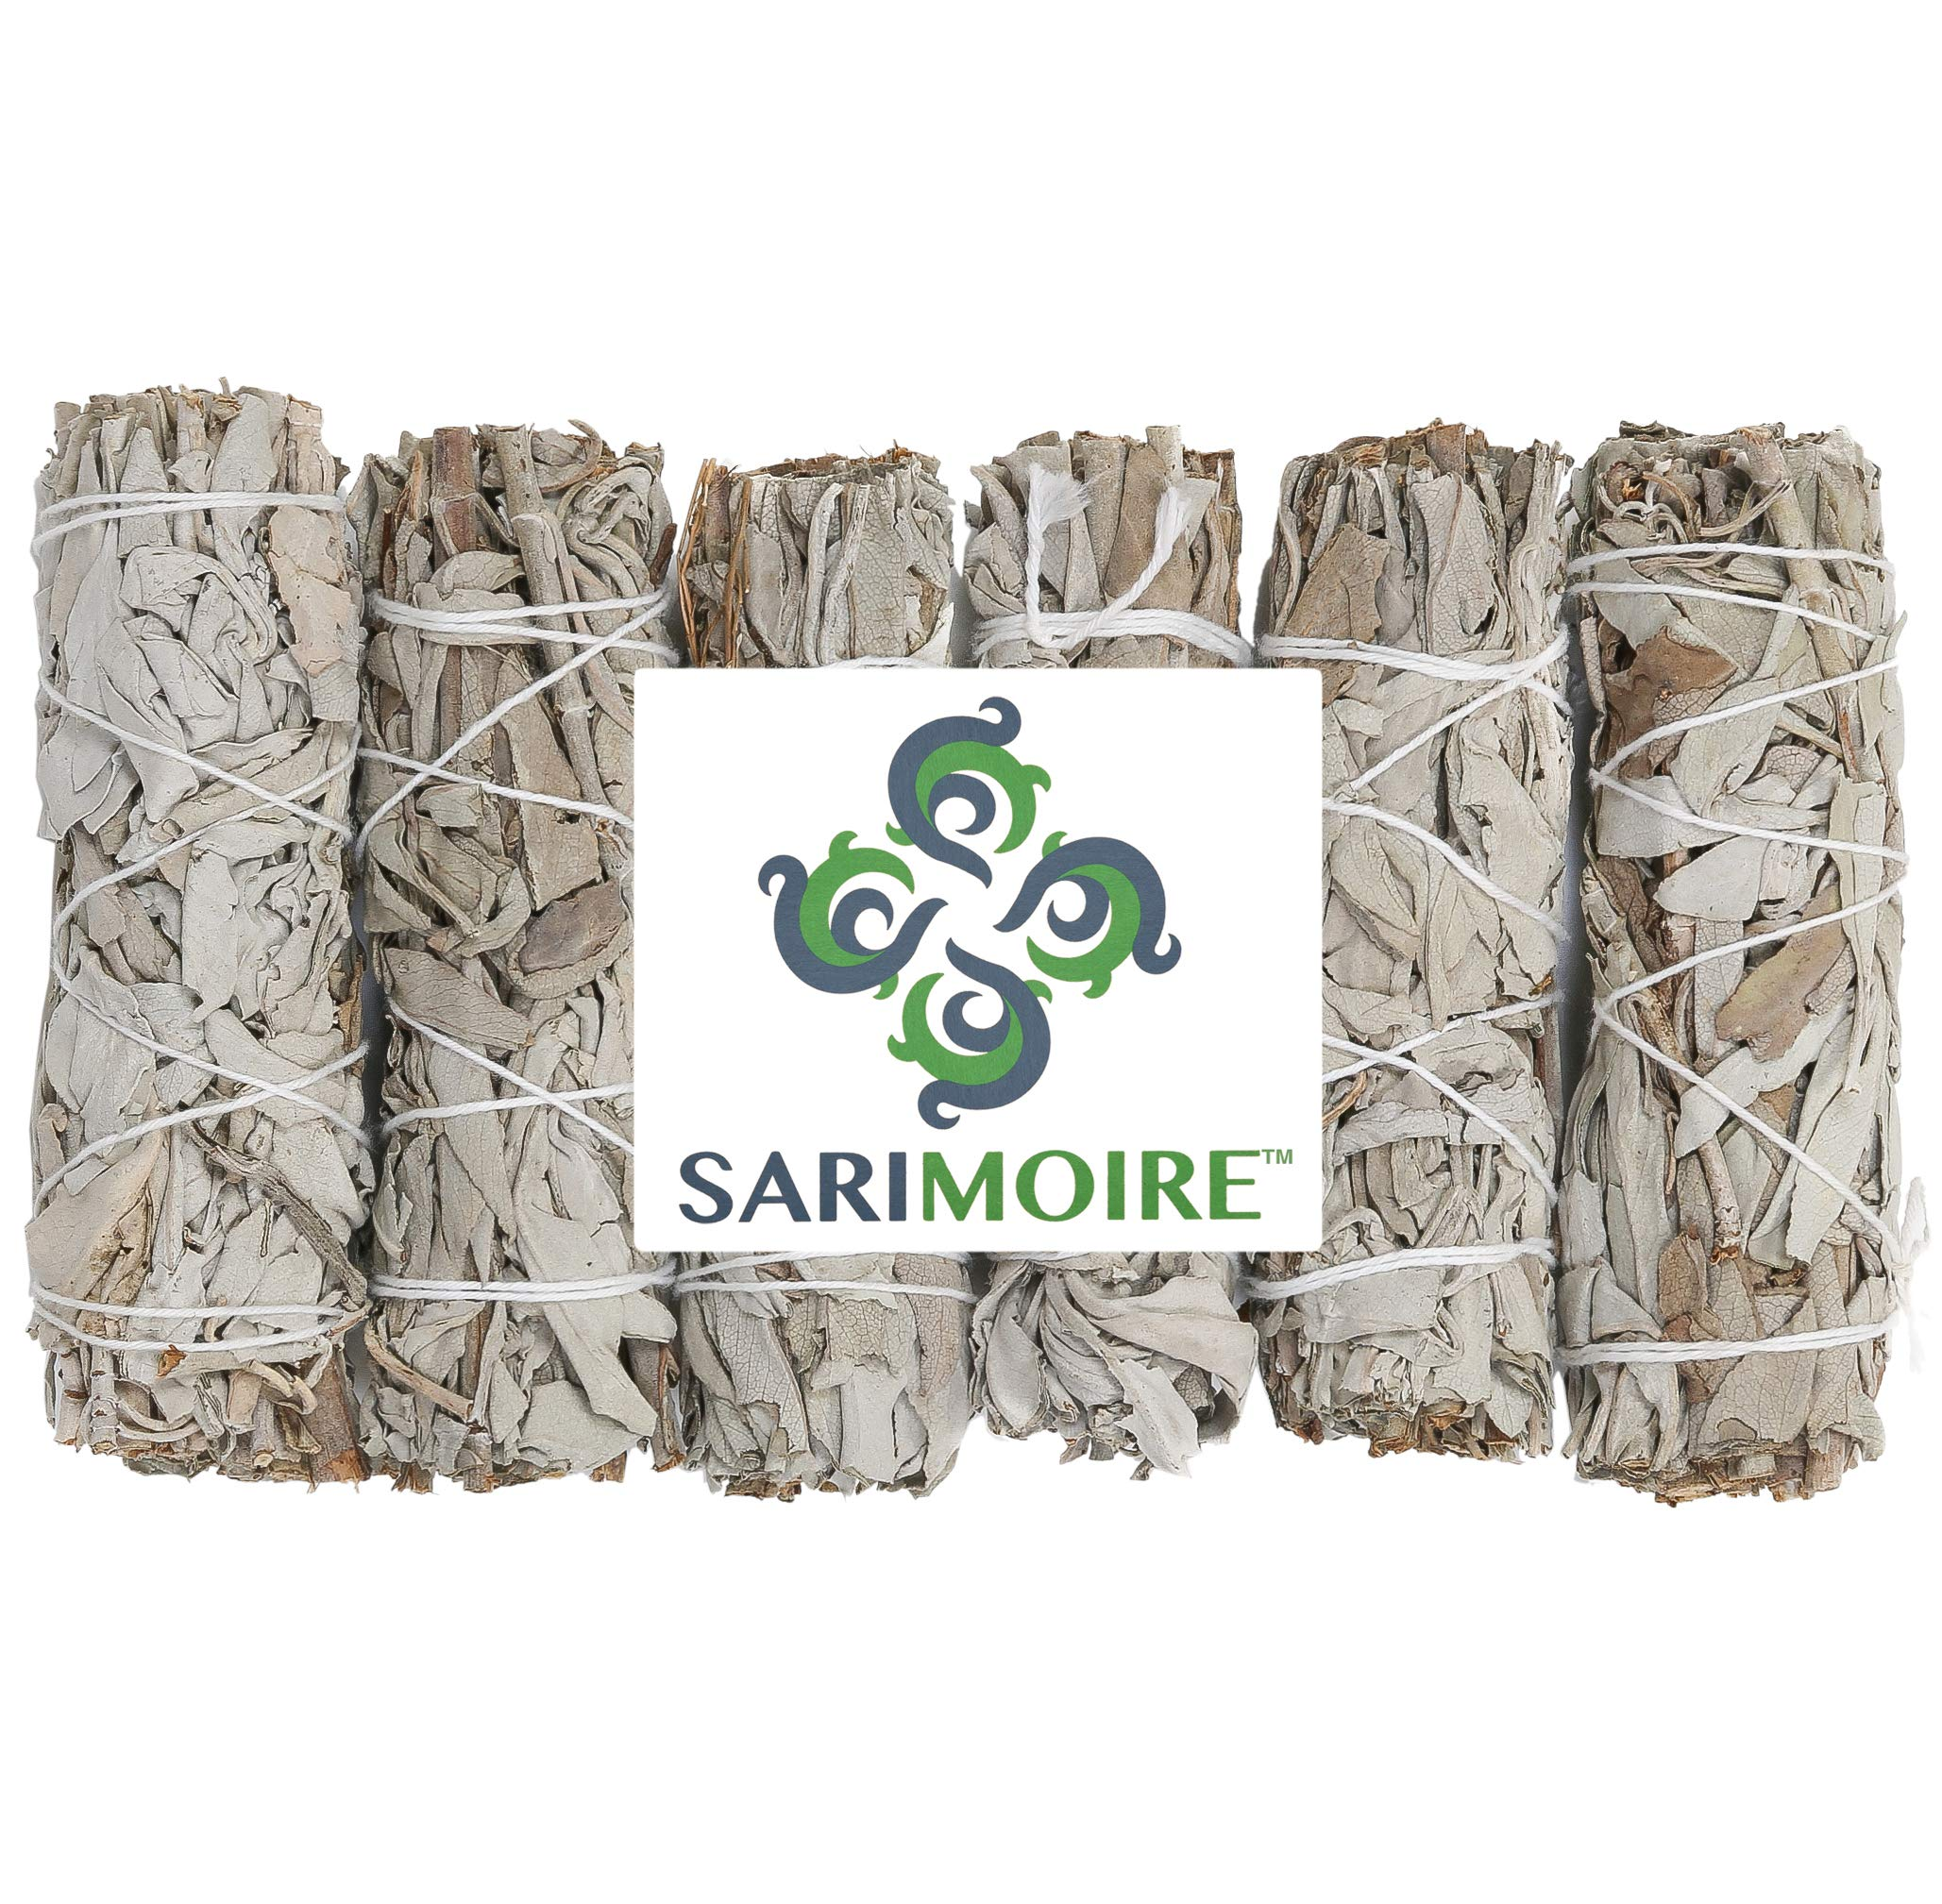 White Sage Smudge Sticks - 6 - 4'' Sage Bundles - Perfect Sage Stick Smudge Sticks Smudging Kit Replenishment by Sarimoire (Image #4)